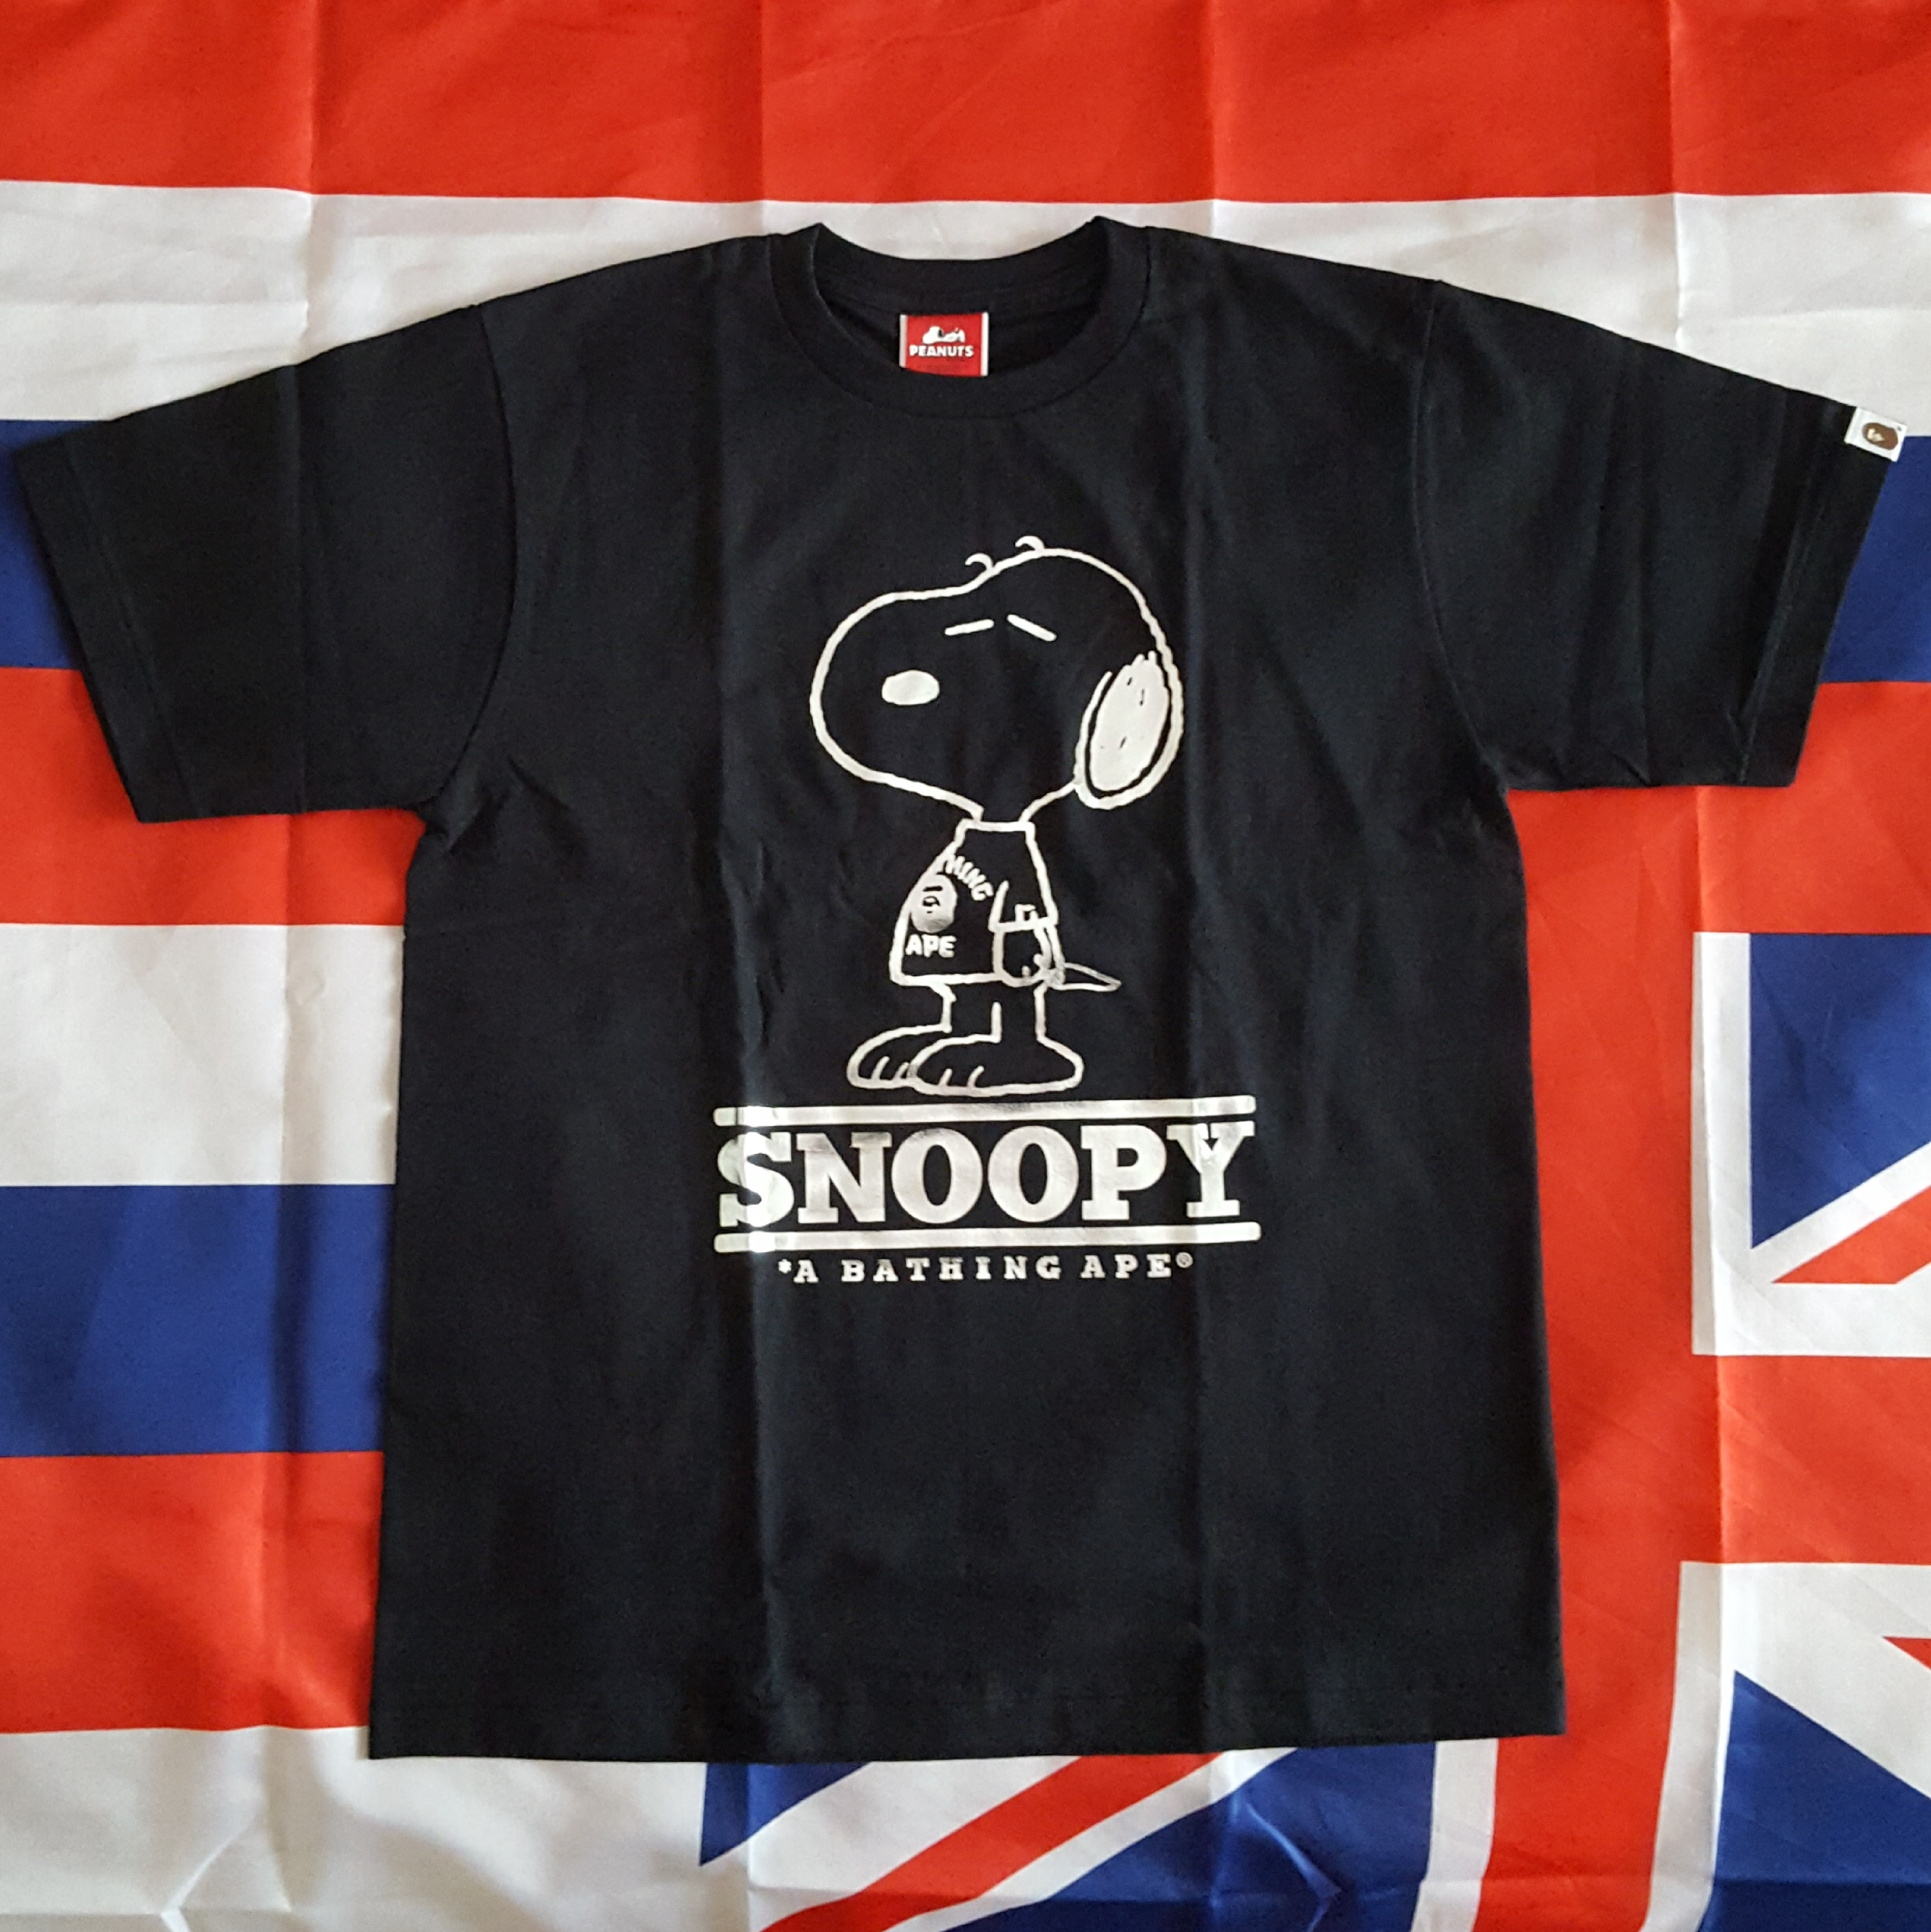 c6dfbaf605d2 Bape × Peanuts ×. Bape x Peanuts Snoopy Silver Foil Tee   Tote NOT supreme  shark hoodie milo kaws ...